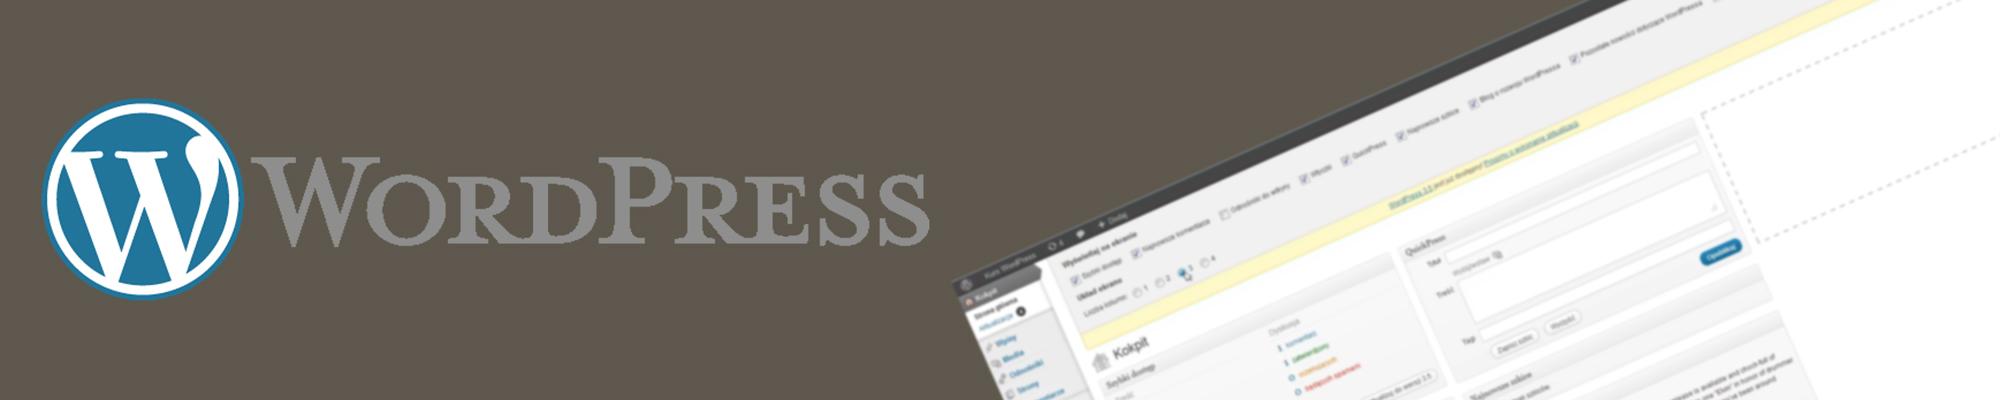 wordpress_blog3